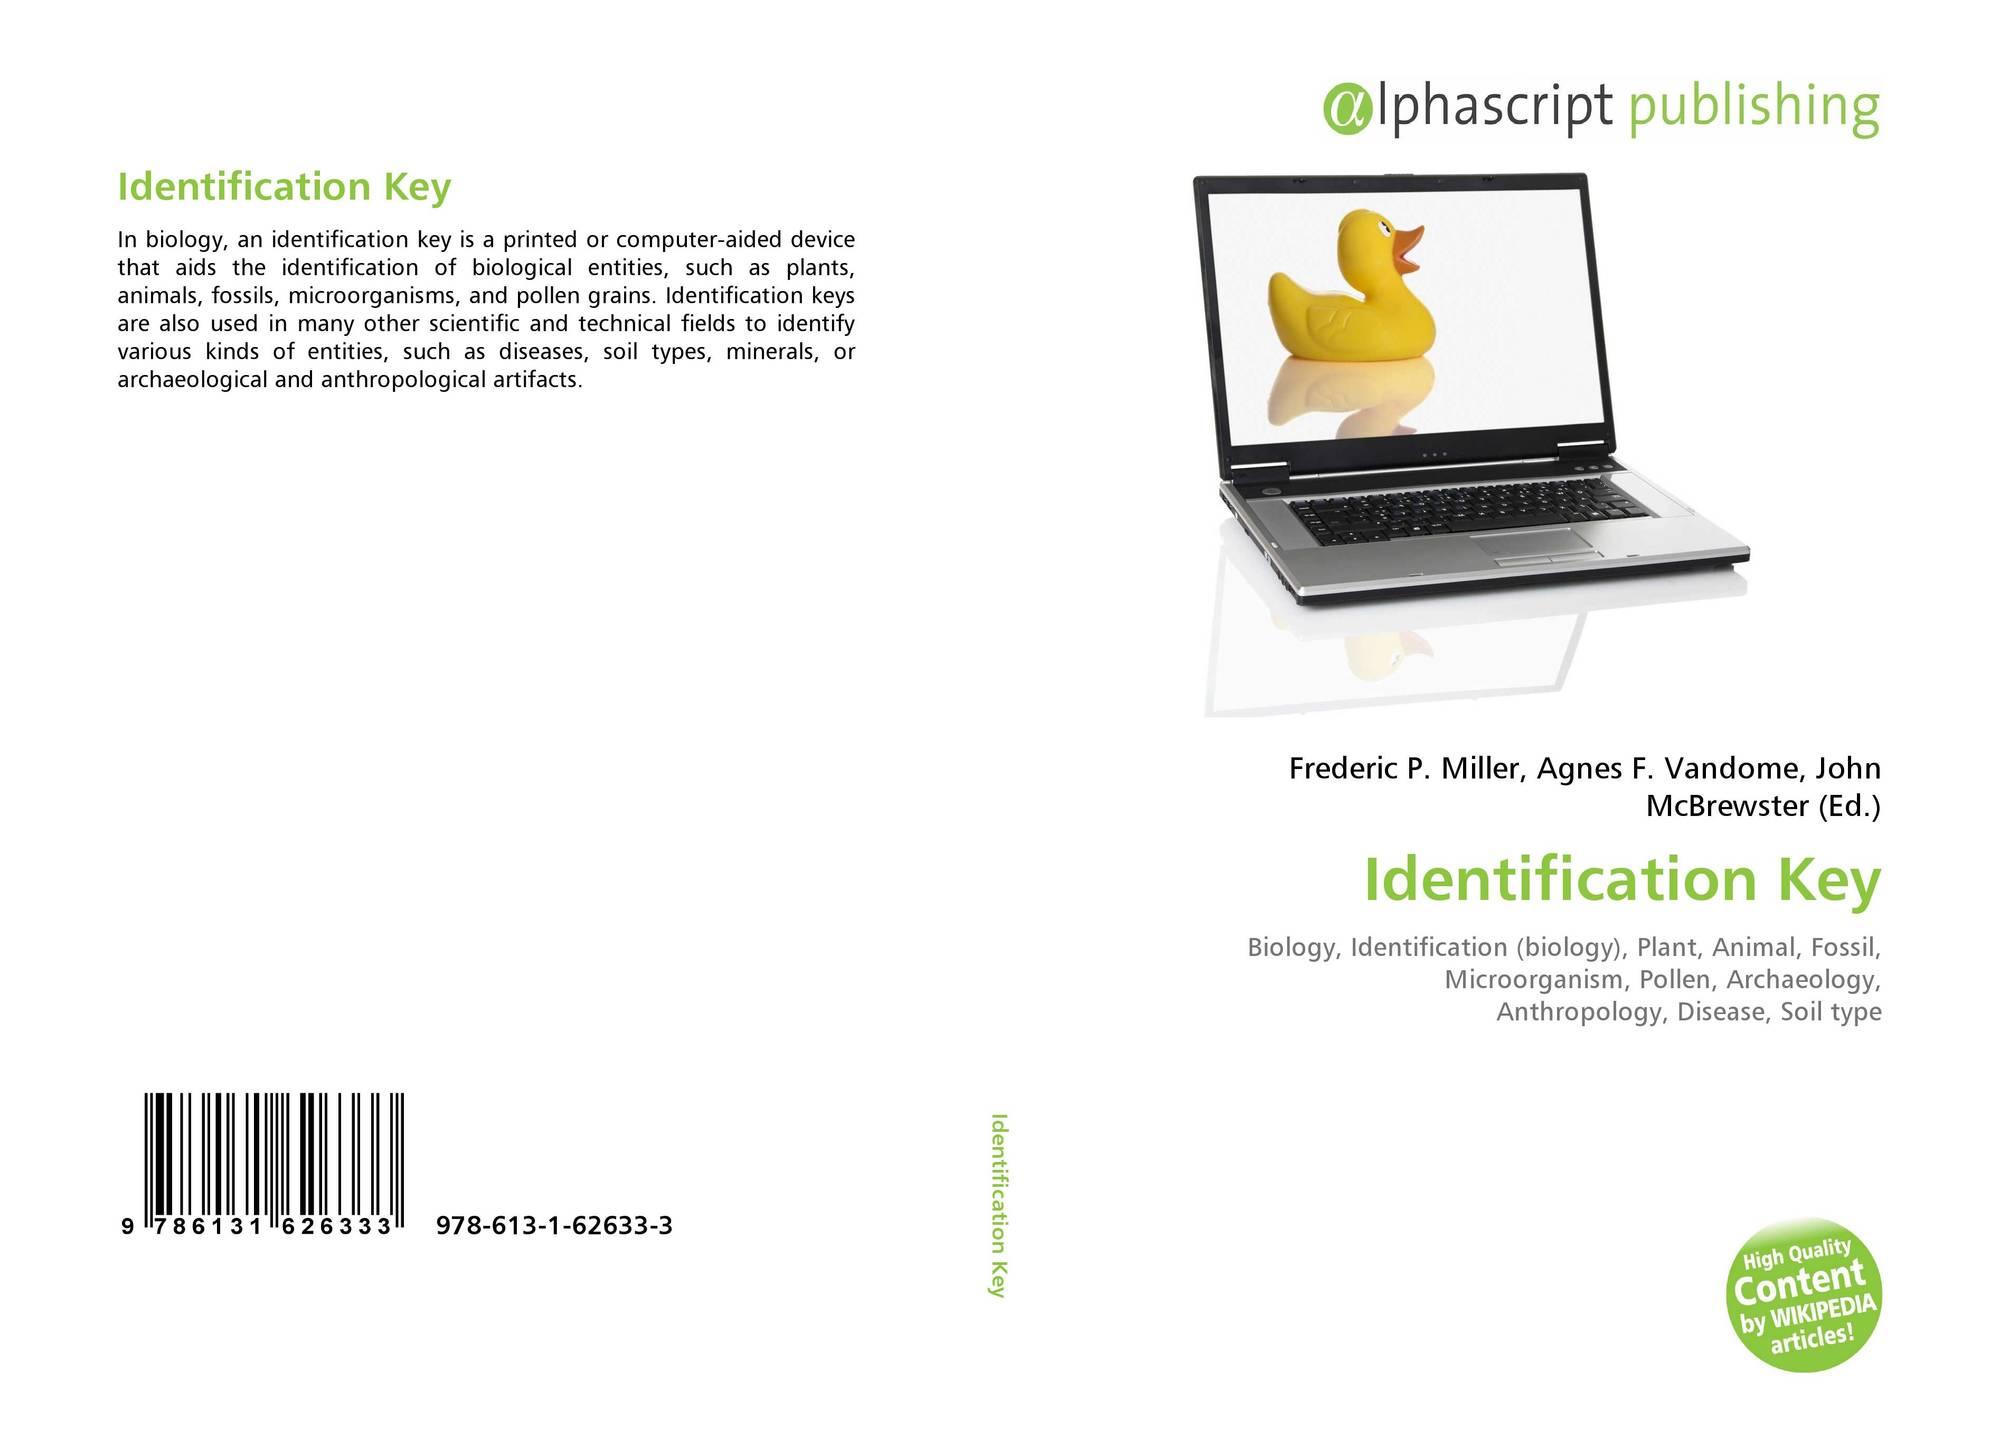 Identification Key, 978-613-1-62633-3, 6131626332 ,9786131626333